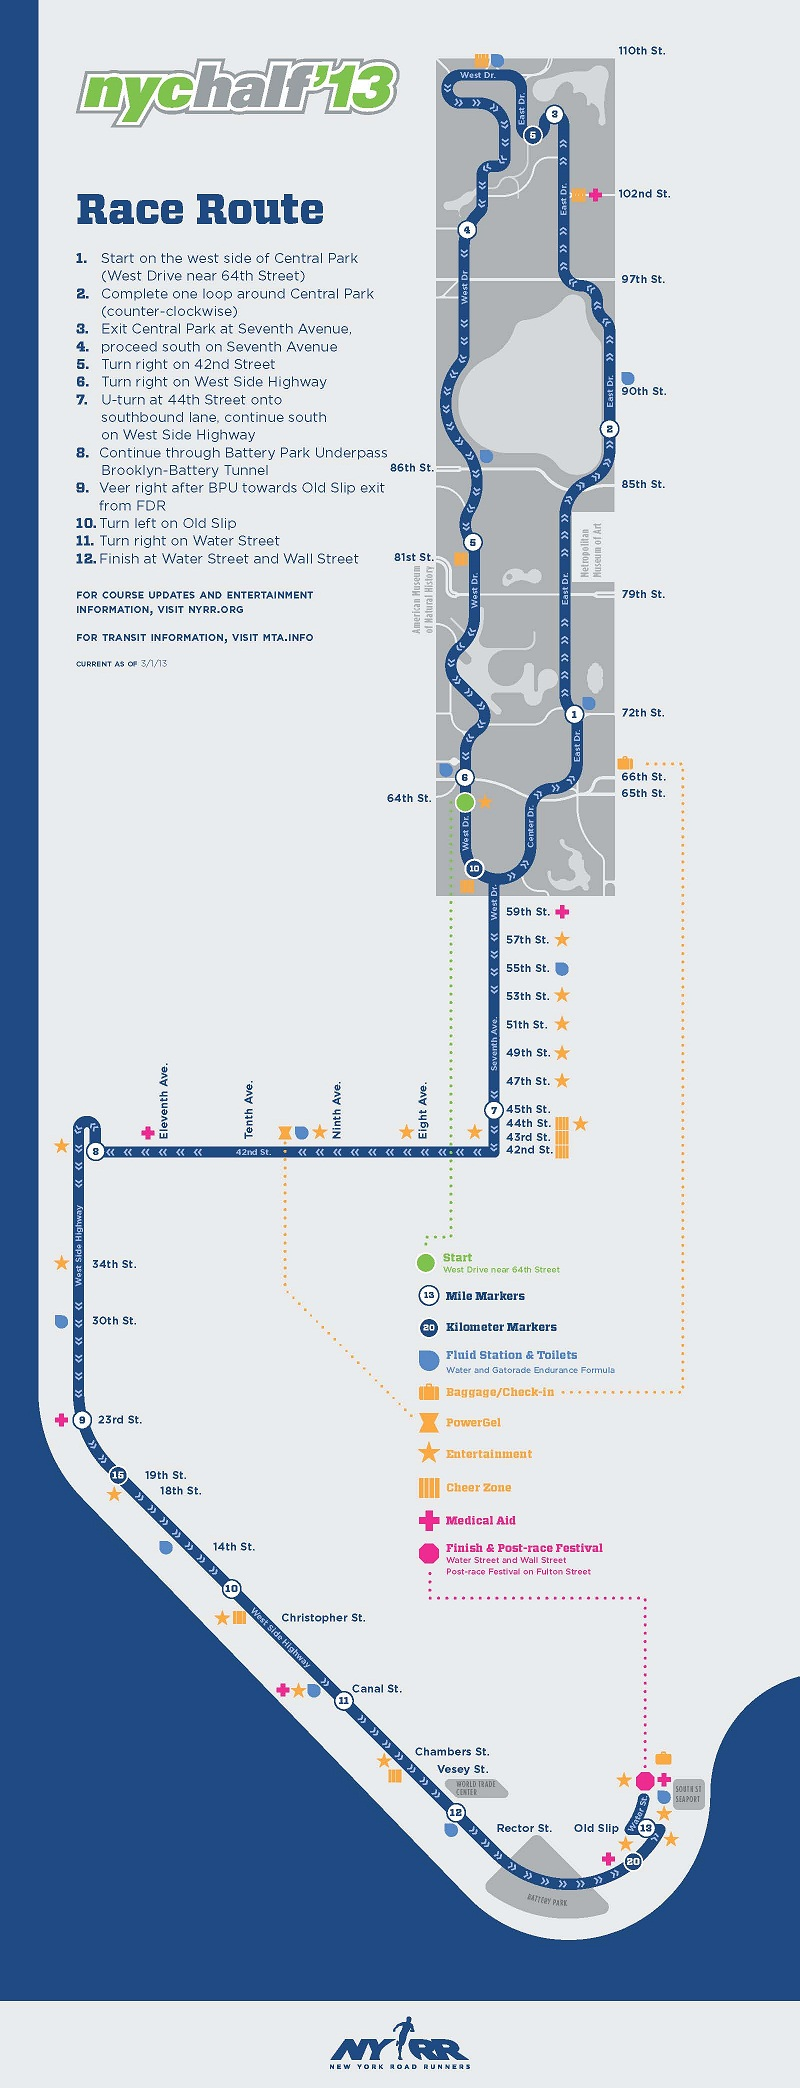 New York City Marathon Map 2013